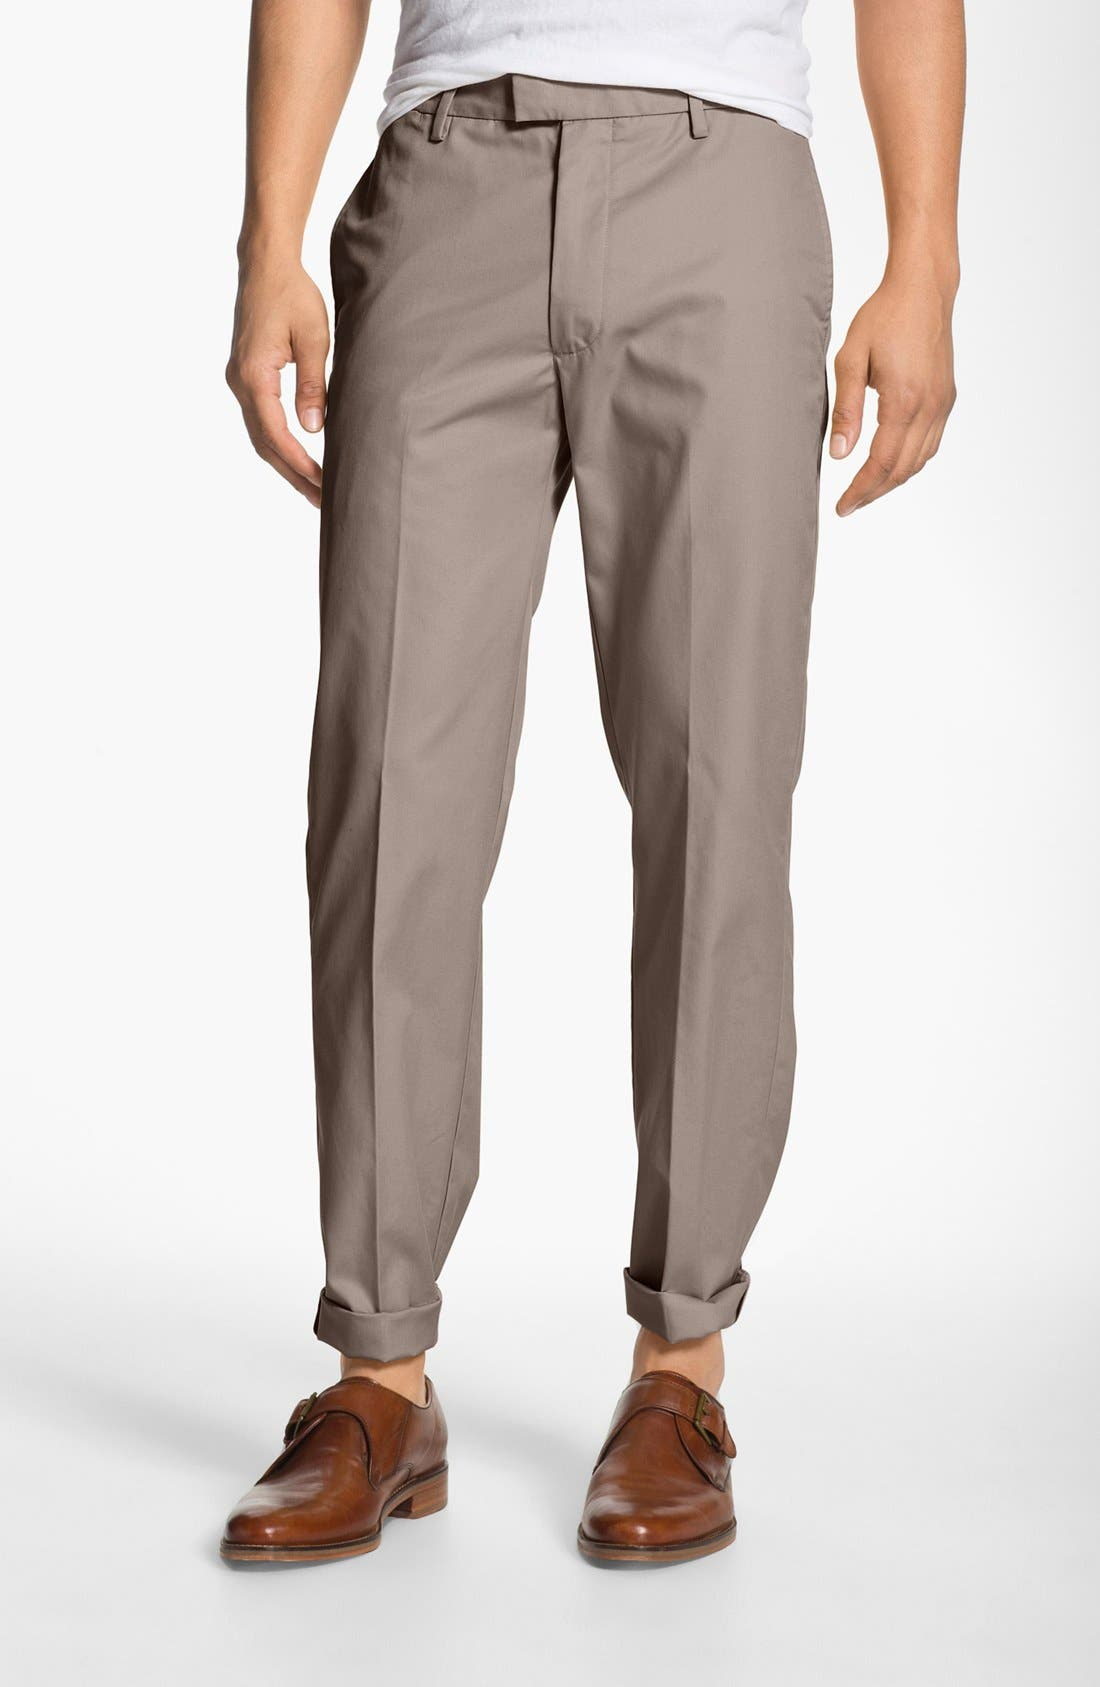 Main Image - Dockers® 'SF Khaki' Modern Slim Fit Dress Chinos